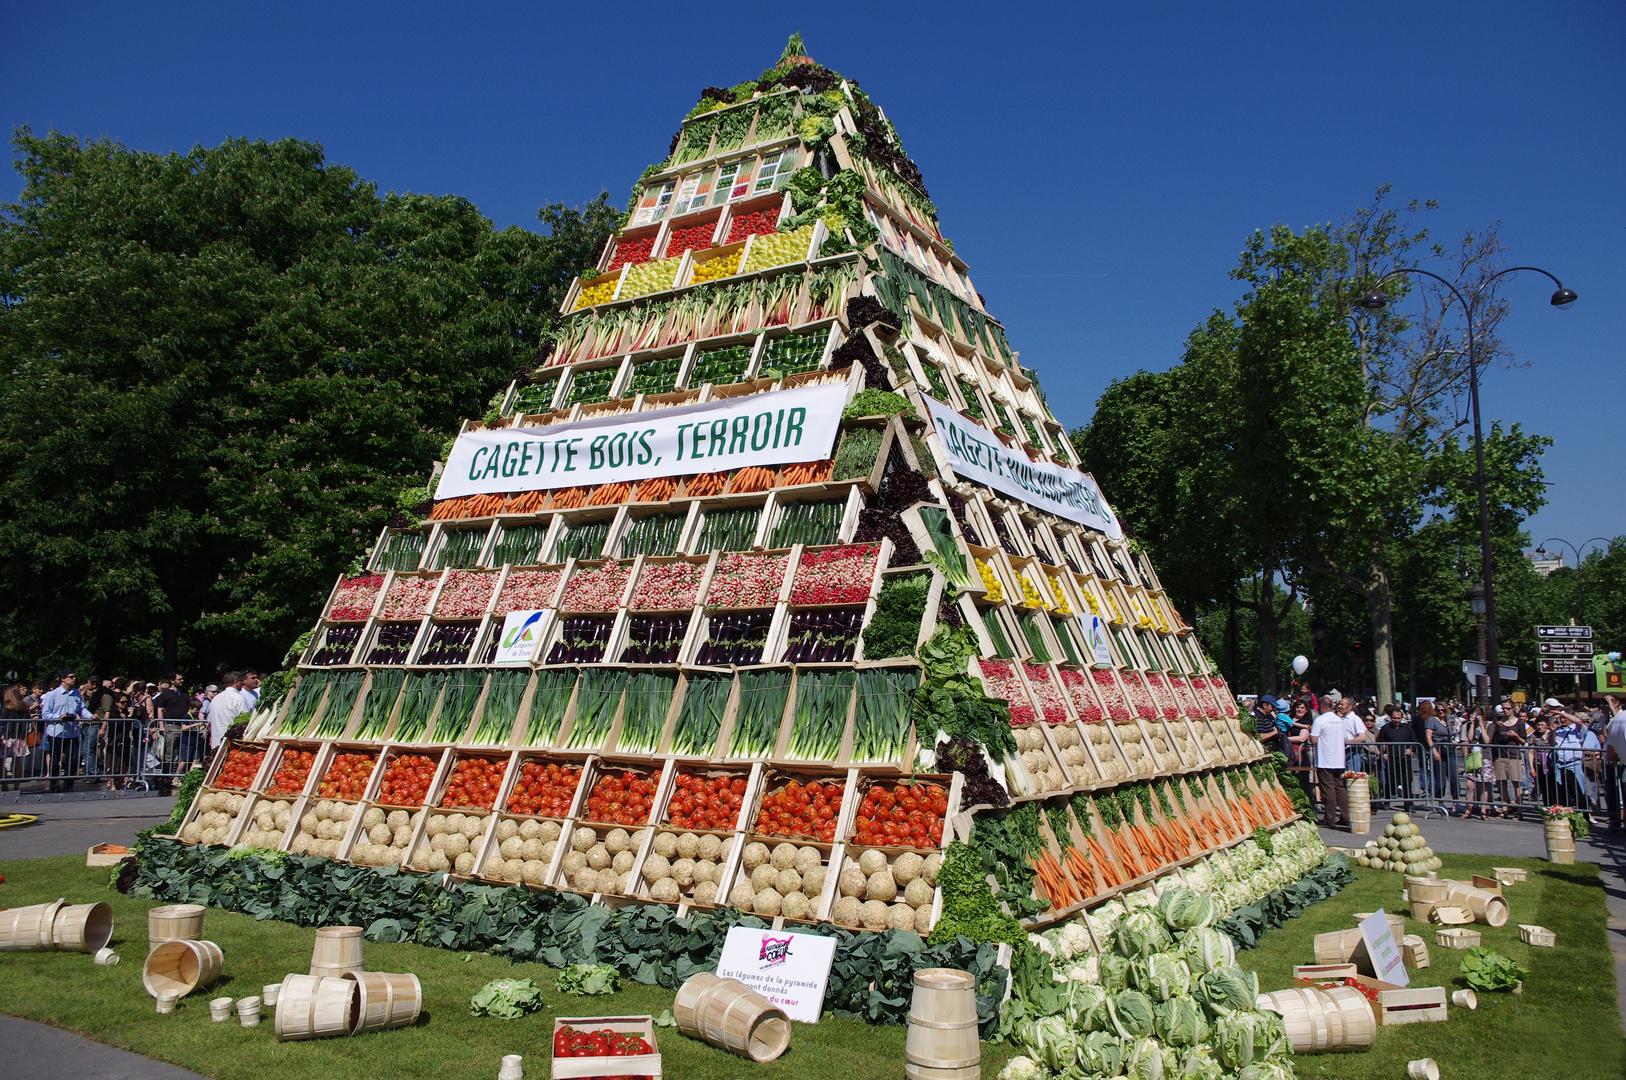 Les Légumes de France